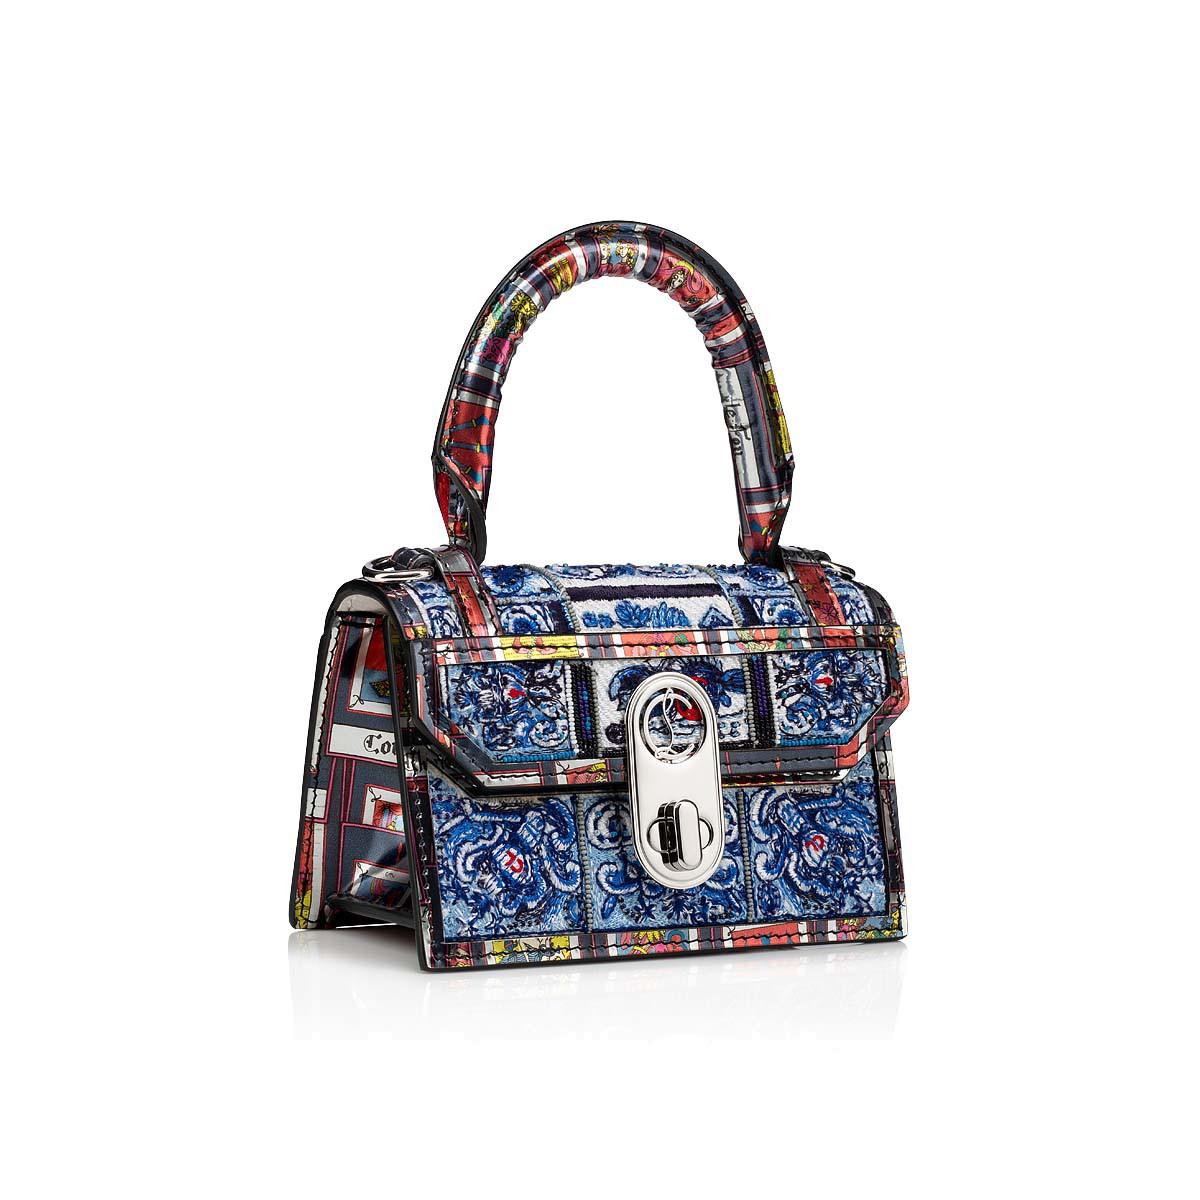 Bags - Elisa Top Handle - Christian Louboutin